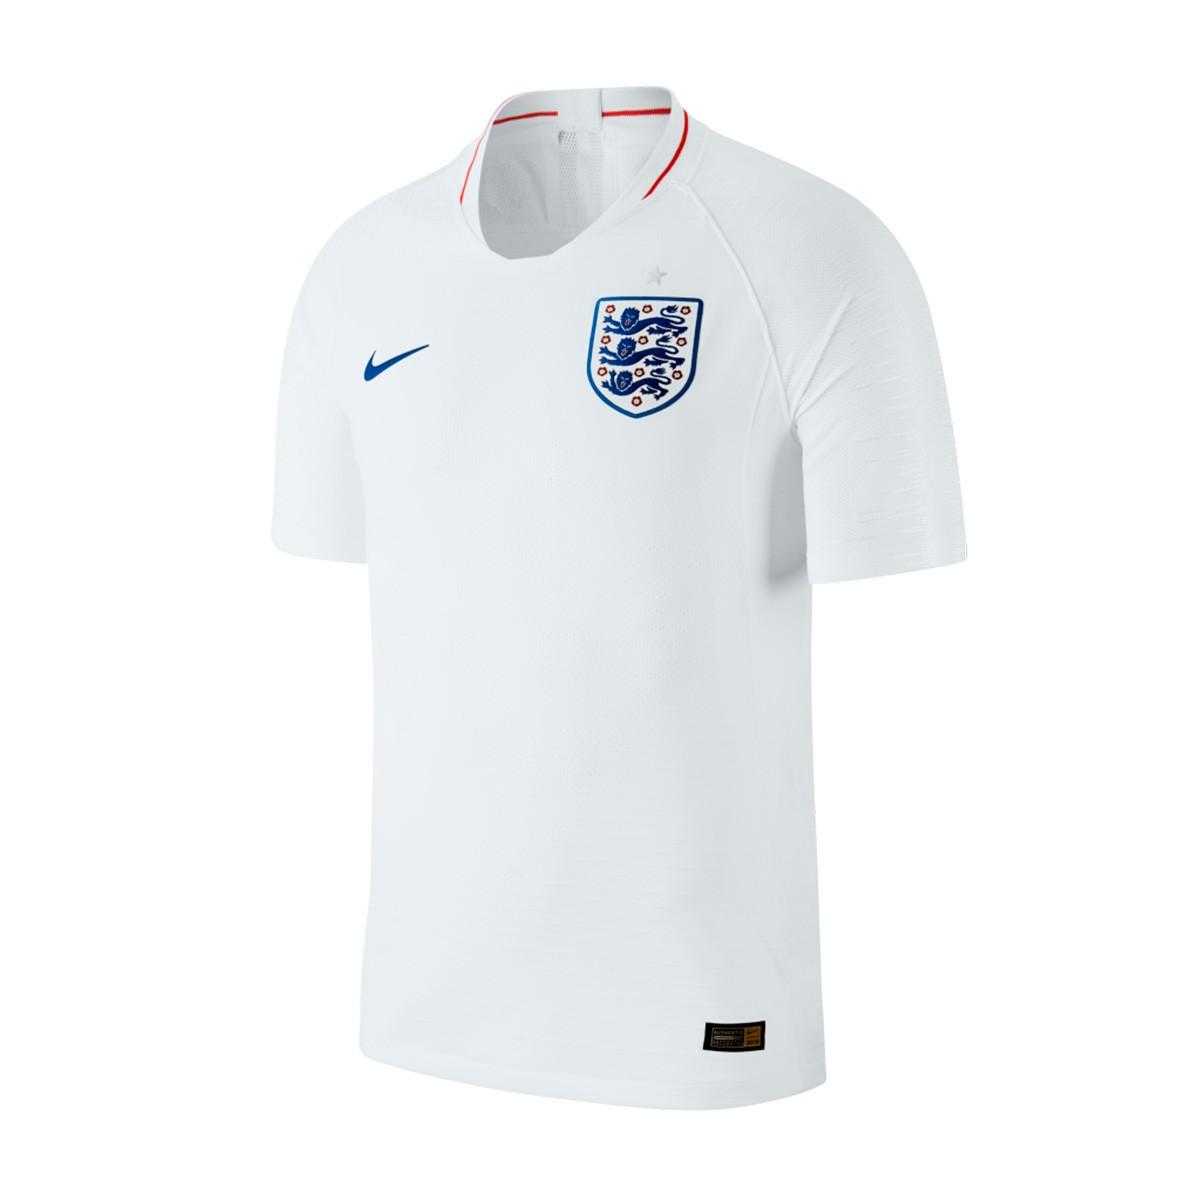 4fd9c010690 Jersey Nike England Vapor 2018-2019 Home White-Sport Royal - Tienda de  fútbol Fútbol Emotion